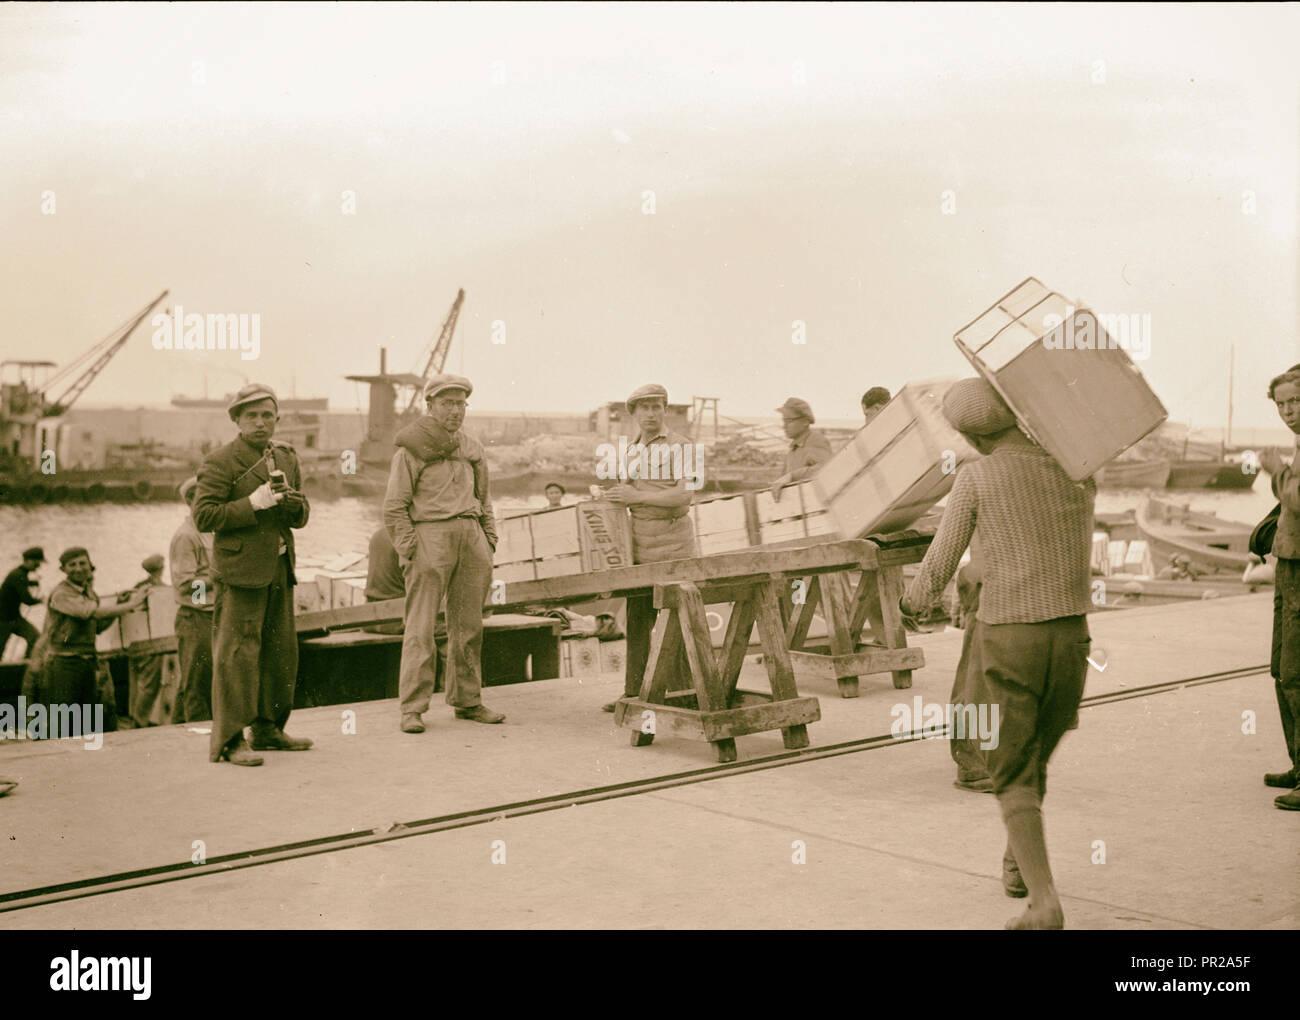 Tel Aviv Harbour. A busy scene, loading lighters with orange boxes. 1939, Israel, Tel Aviv - Stock Image